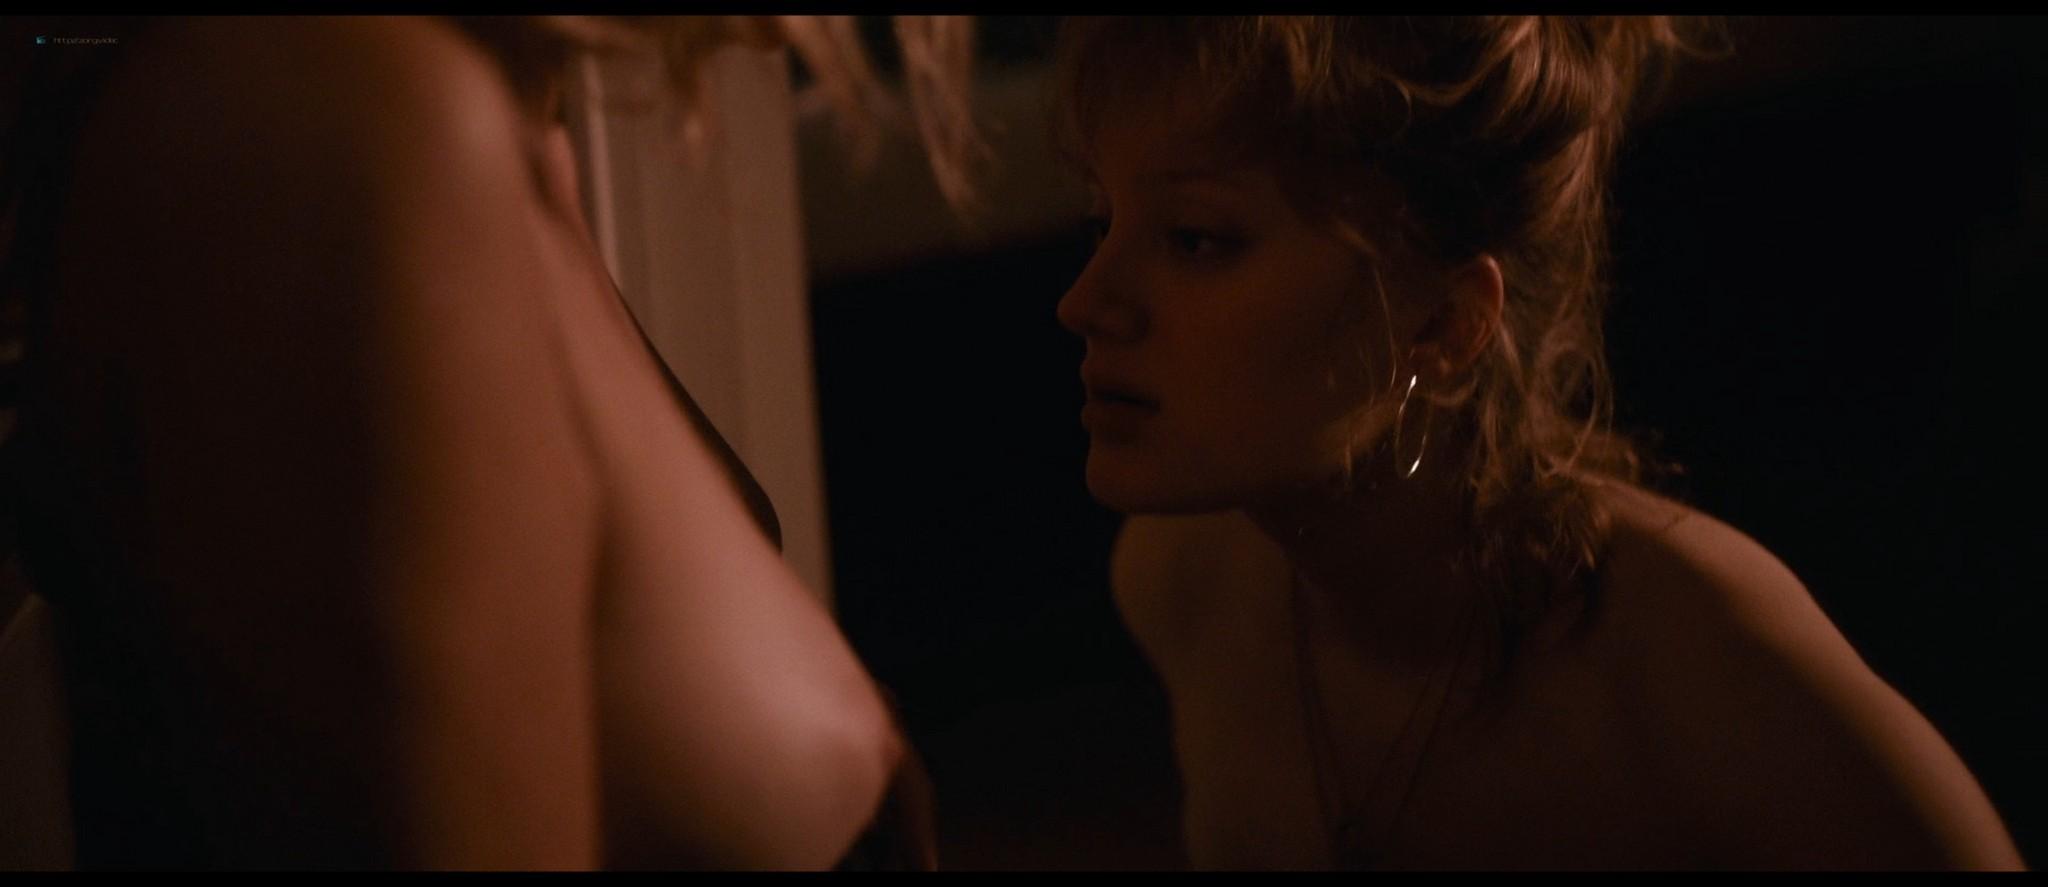 Nadia Tereszkiewicz nude lesbian sex with Valeria Bruni Tedeschi - Seules les bêtes (FR-2019) HD 1080p BluRay (11)